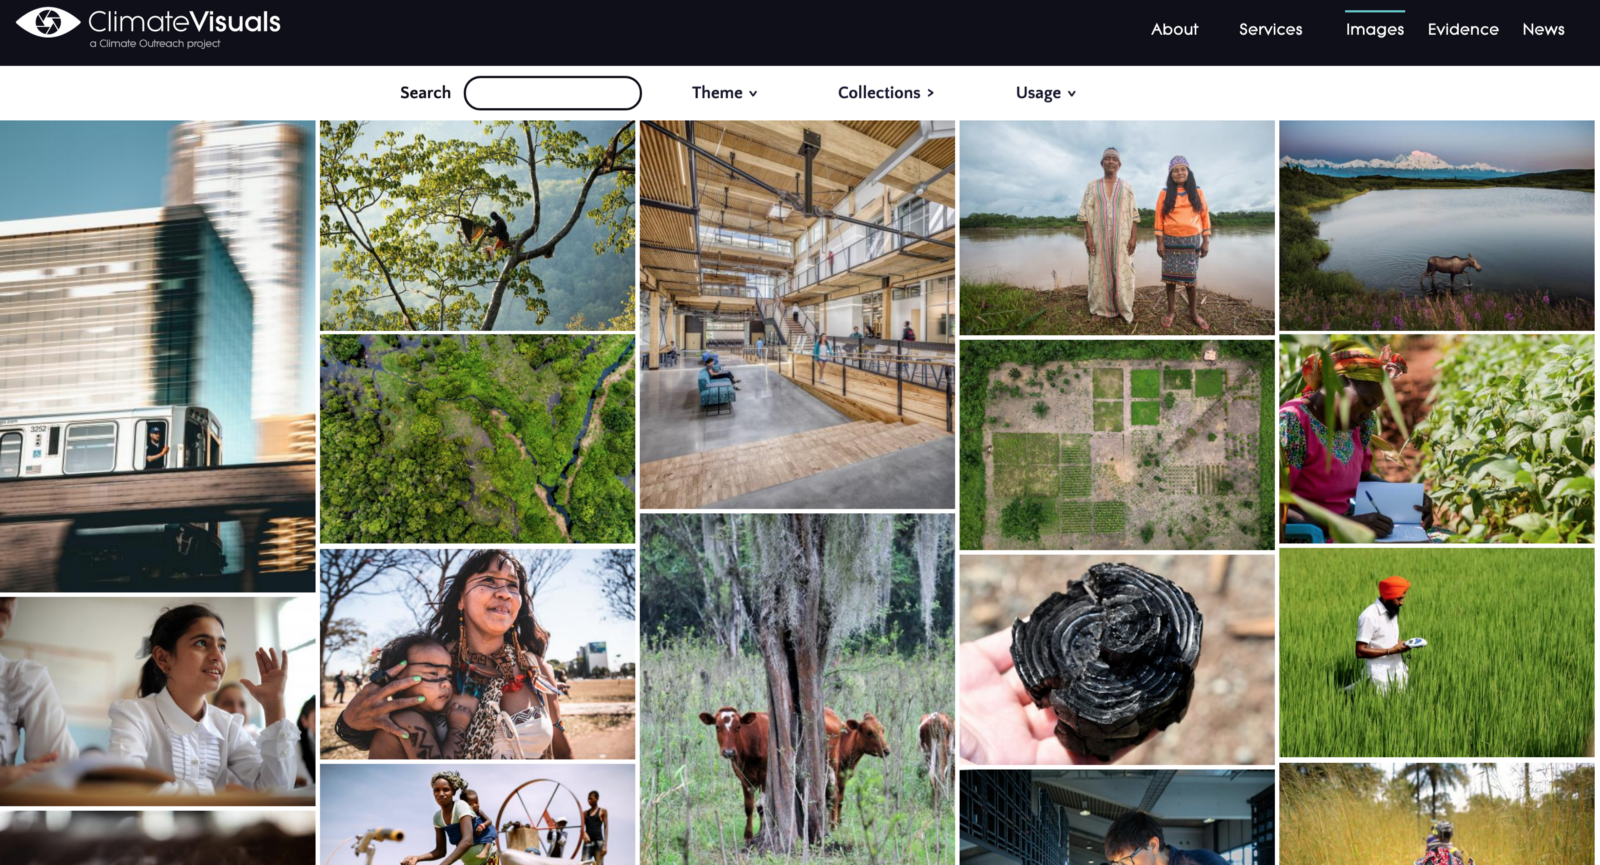 Climate Visuals website